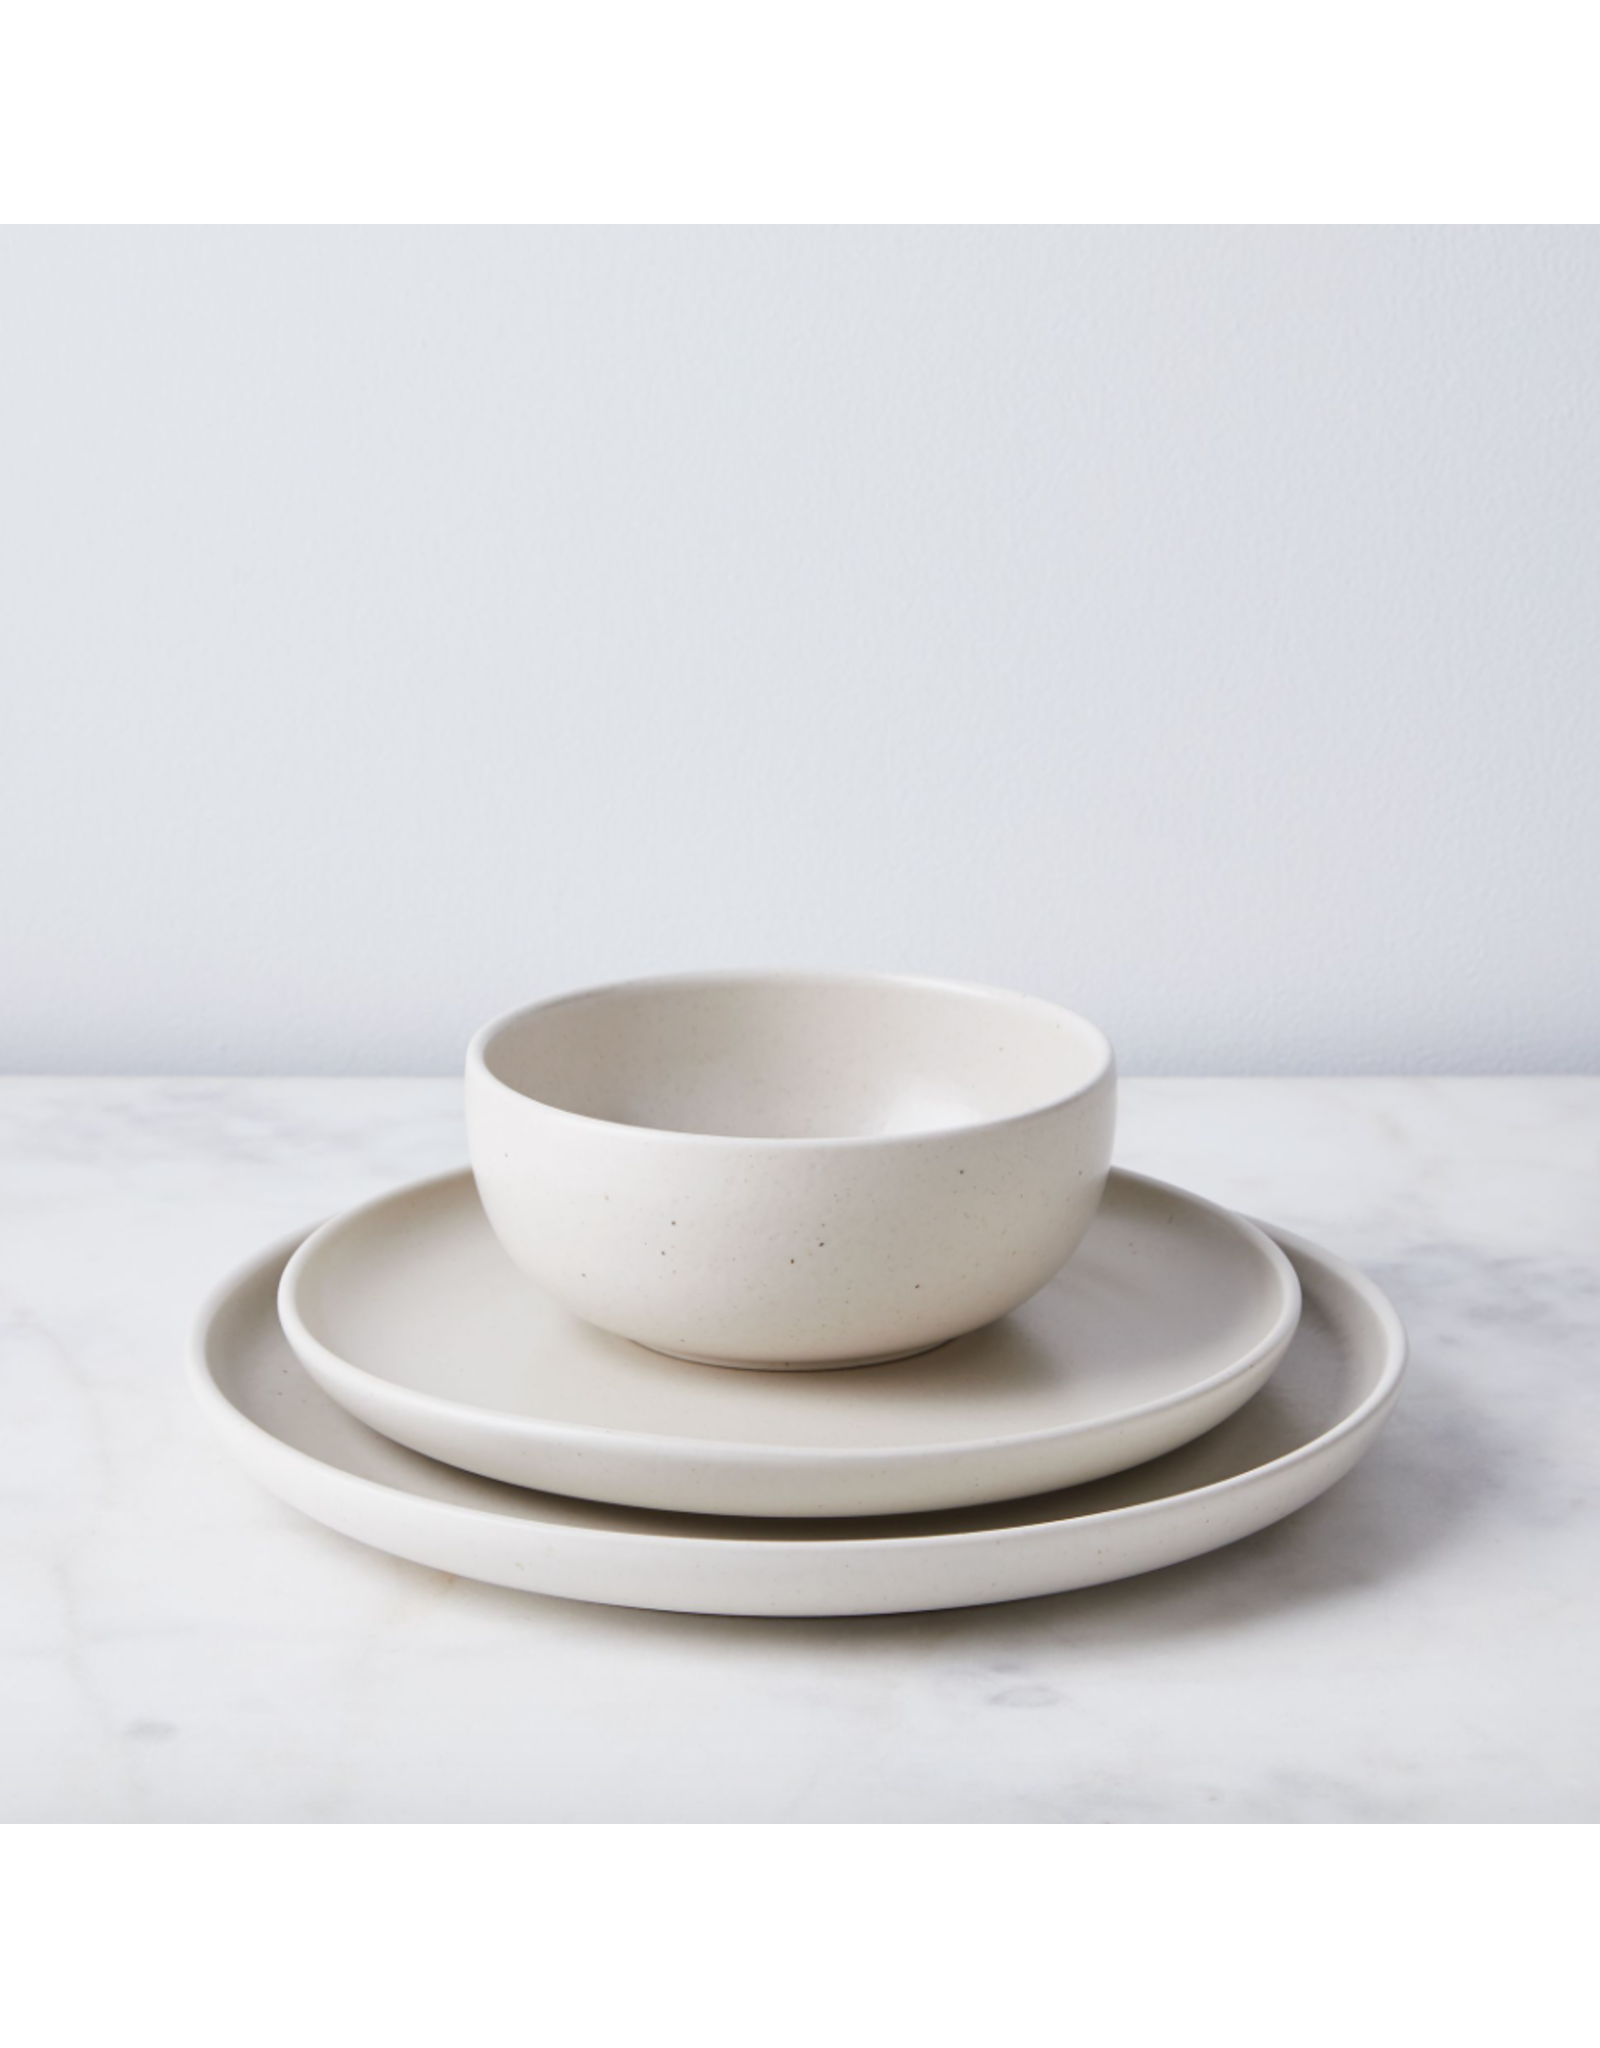 Kitchen Trend Ovale schaal 41cm Pacifica creme